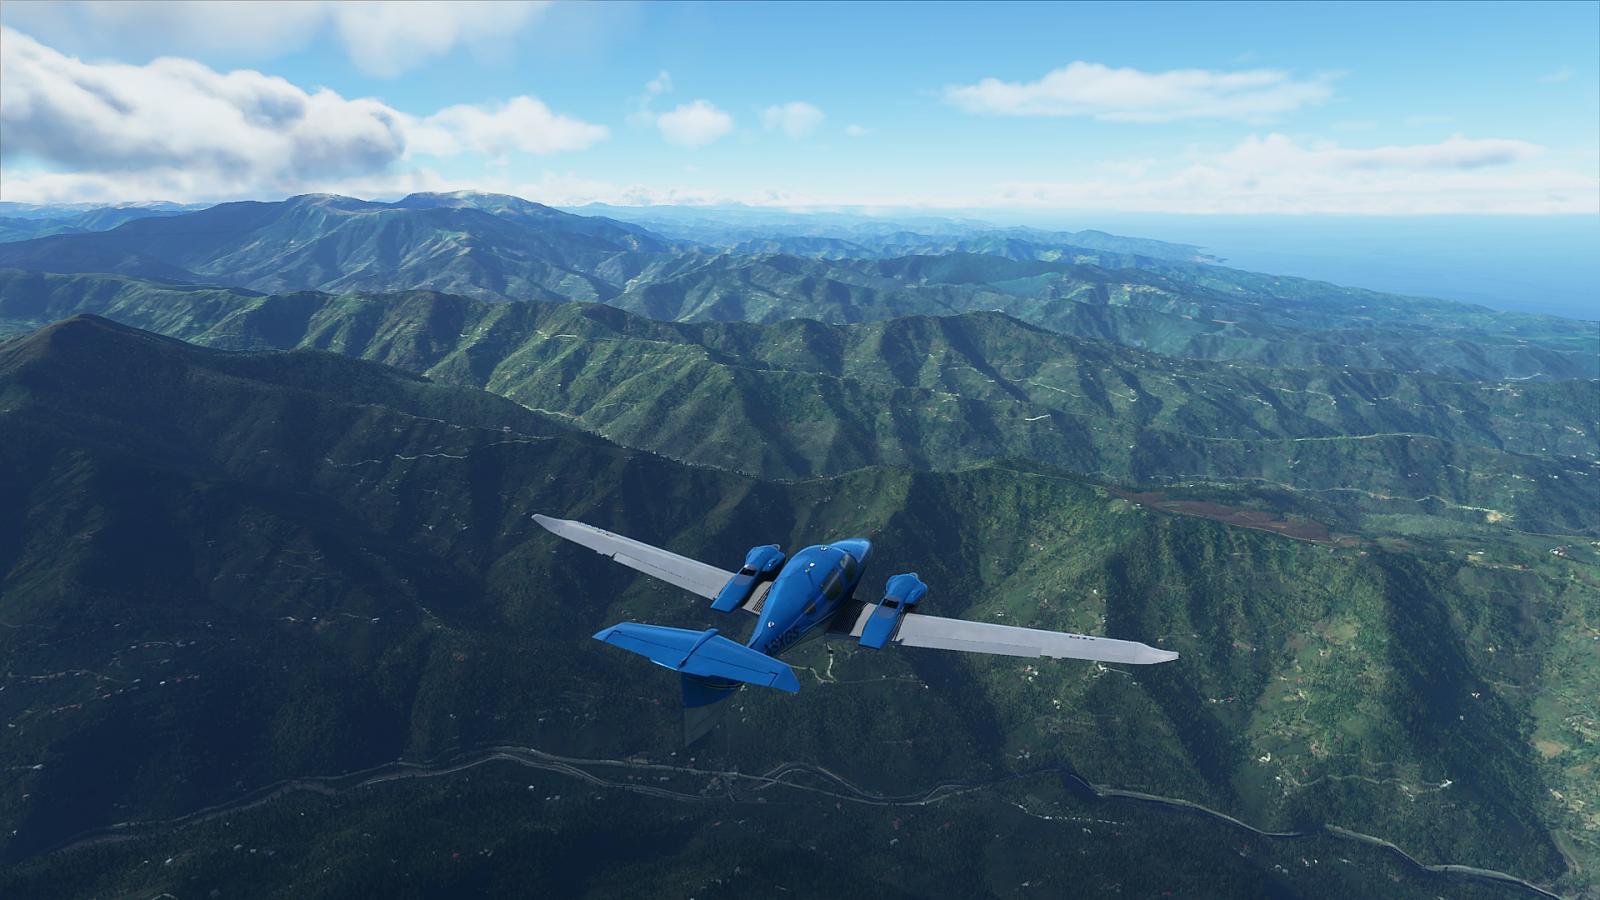 İsim:  Microsoft Flight Simulator Screenshot 2020.08.21 - 20.11.28.66.jpg Görüntüleme: 122 Büyüklük:  154.5 KB (Kilobyte)